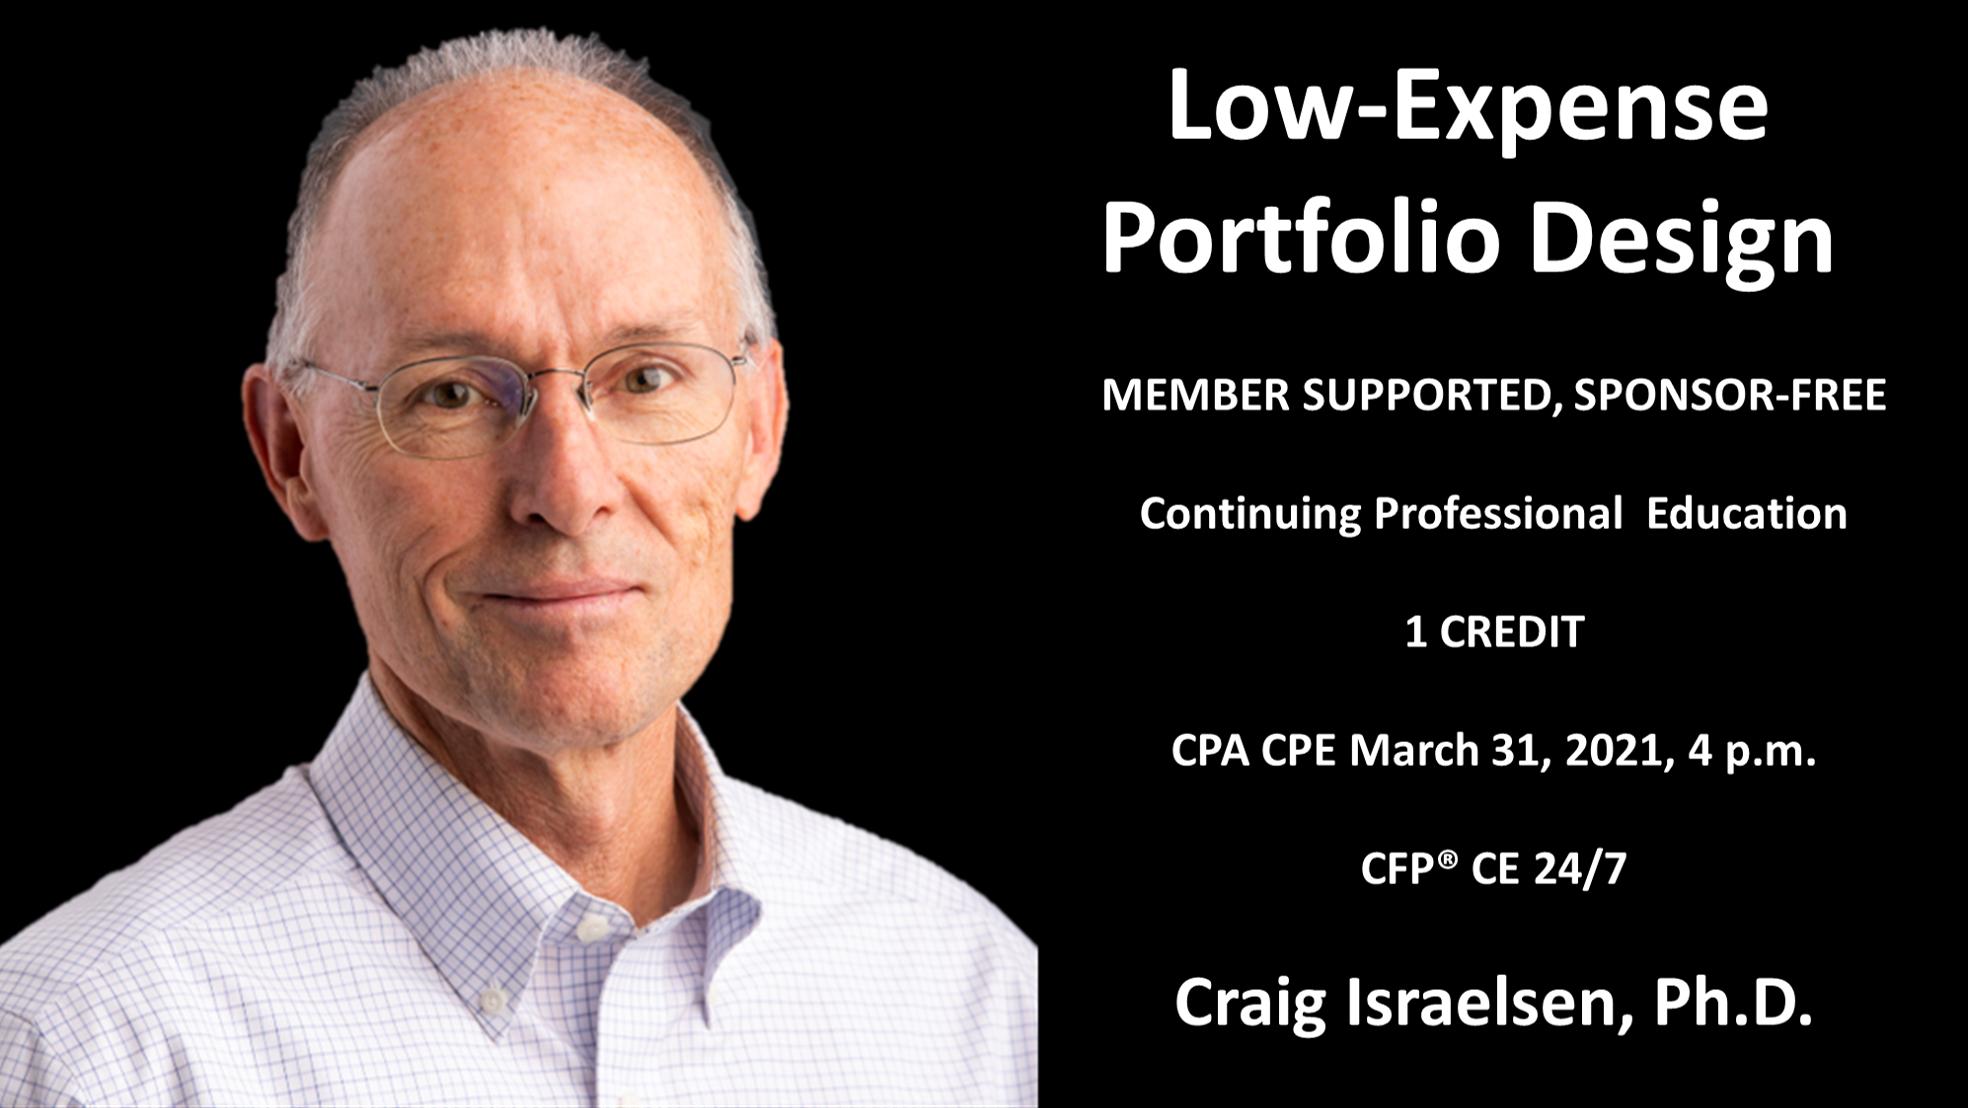 Craig Israelsen's March Webinar